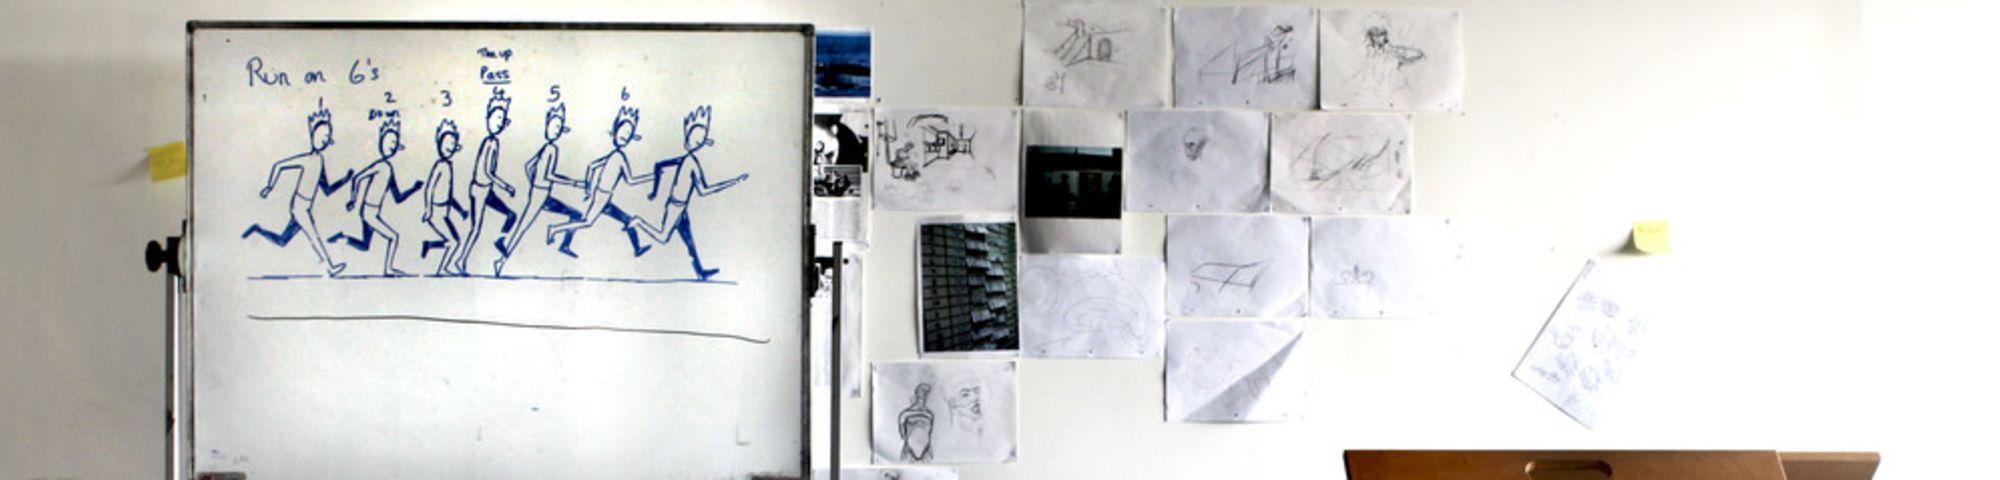 Portfolio Animation Interactive Film Subject Child Image